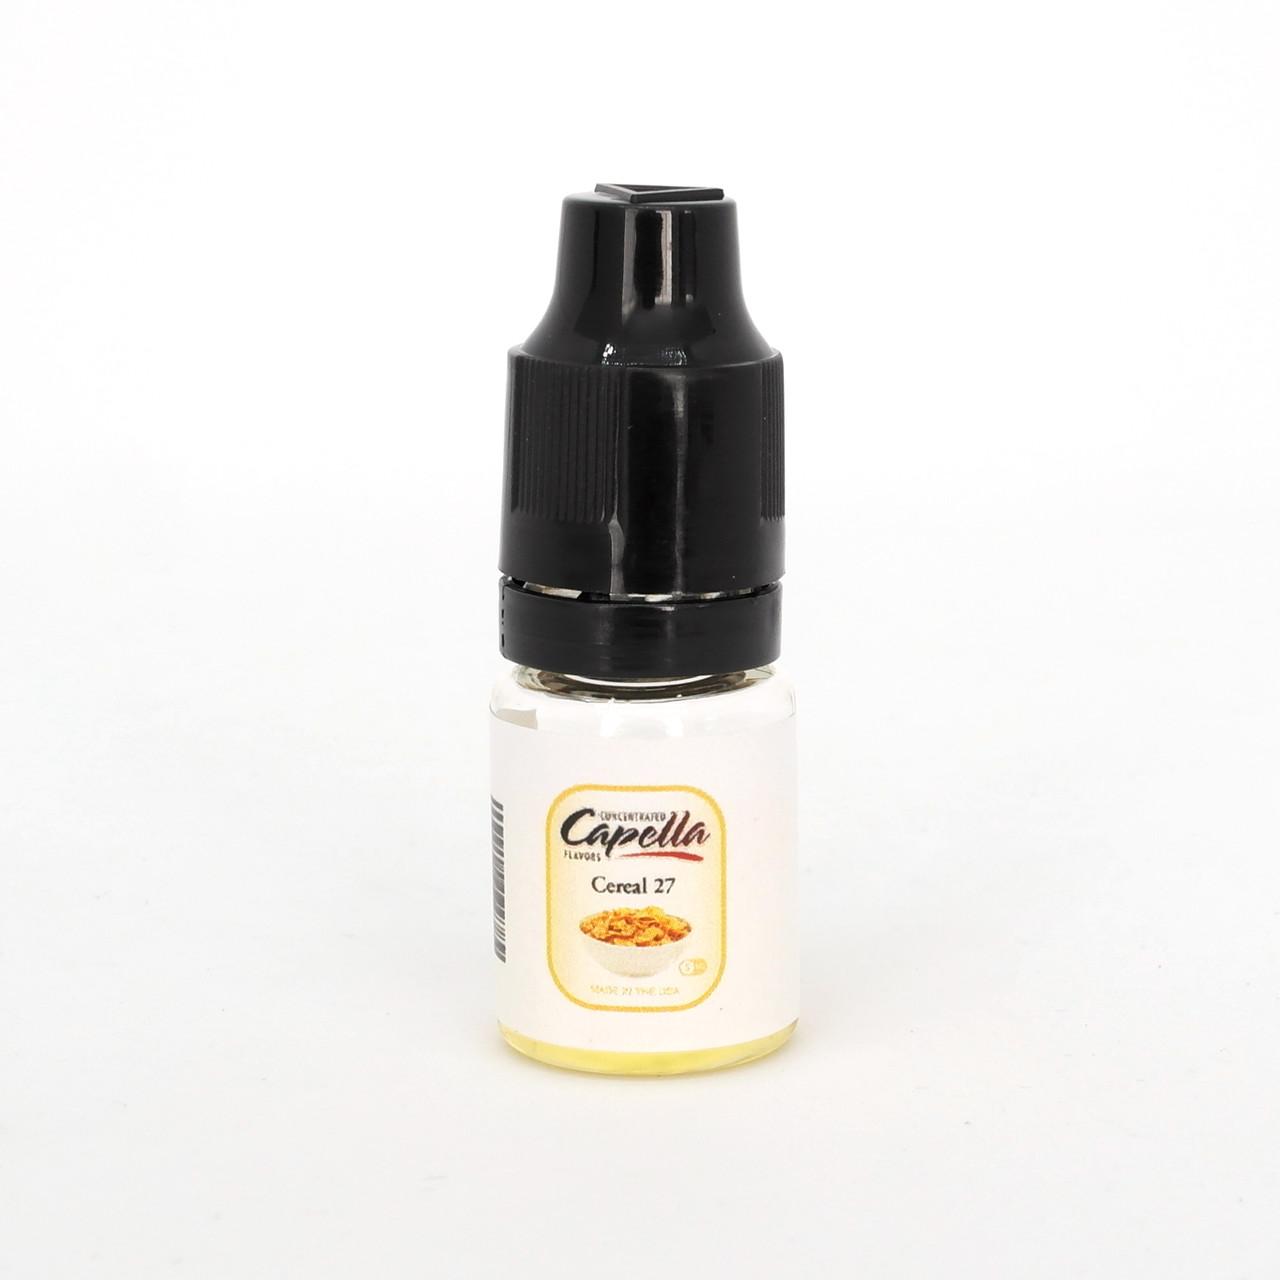 Ароматизатор Capella Cereal 27 (Хлопья с молоком) 5 мл. (0206)